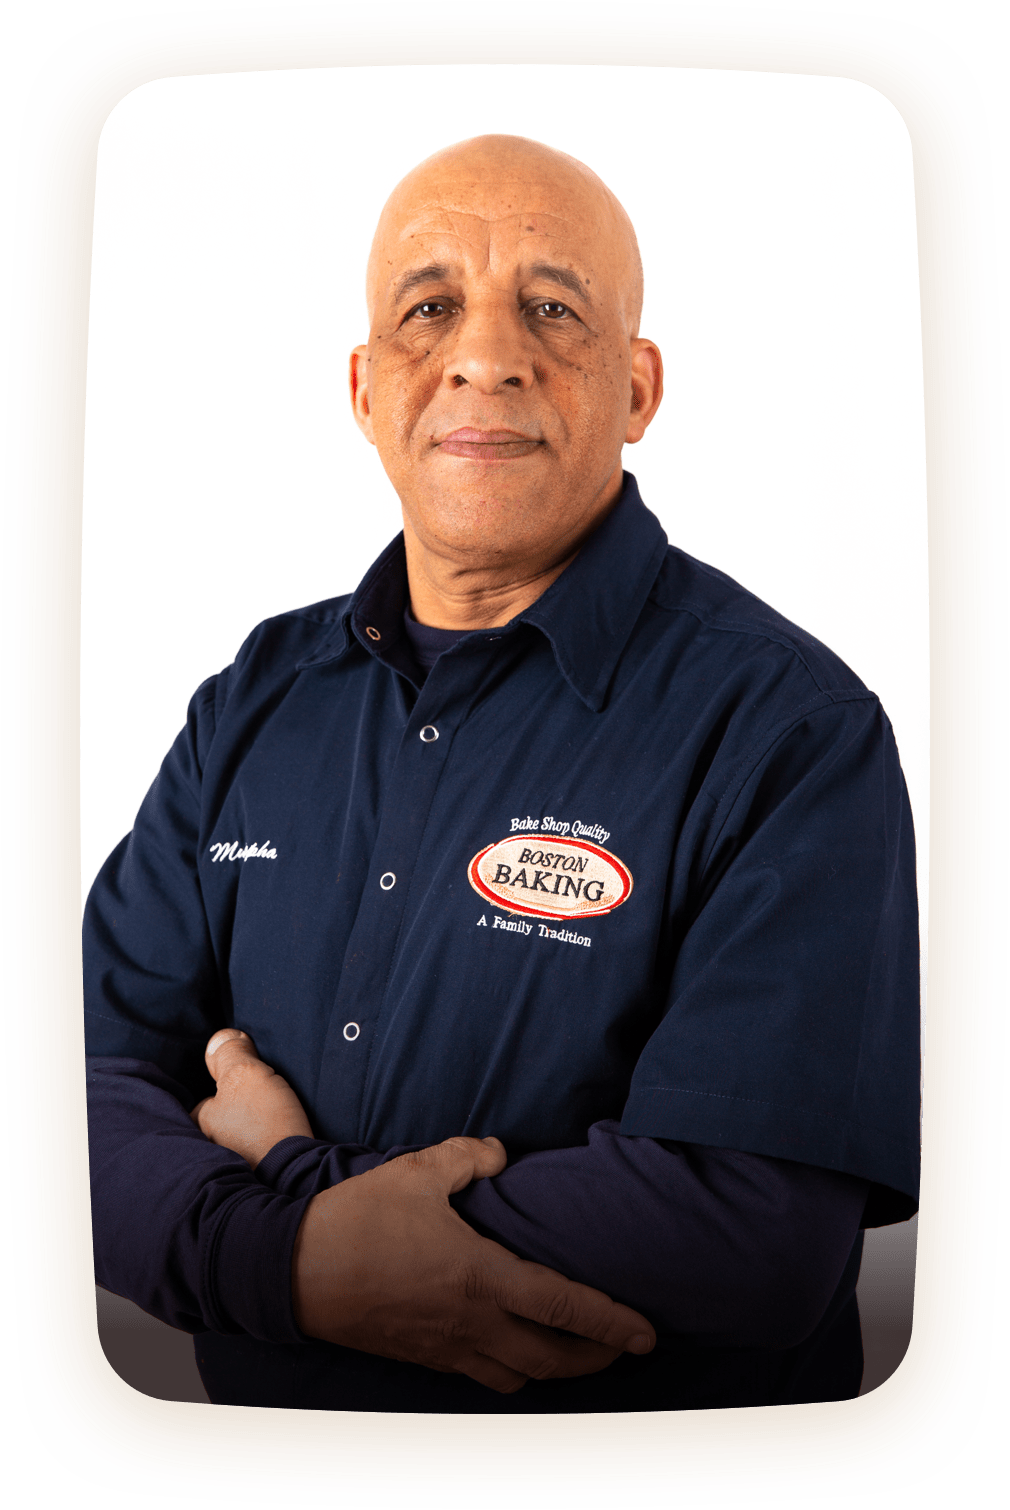 Mustapha Faddi, Facilities, Maintenance, & Safety Manager